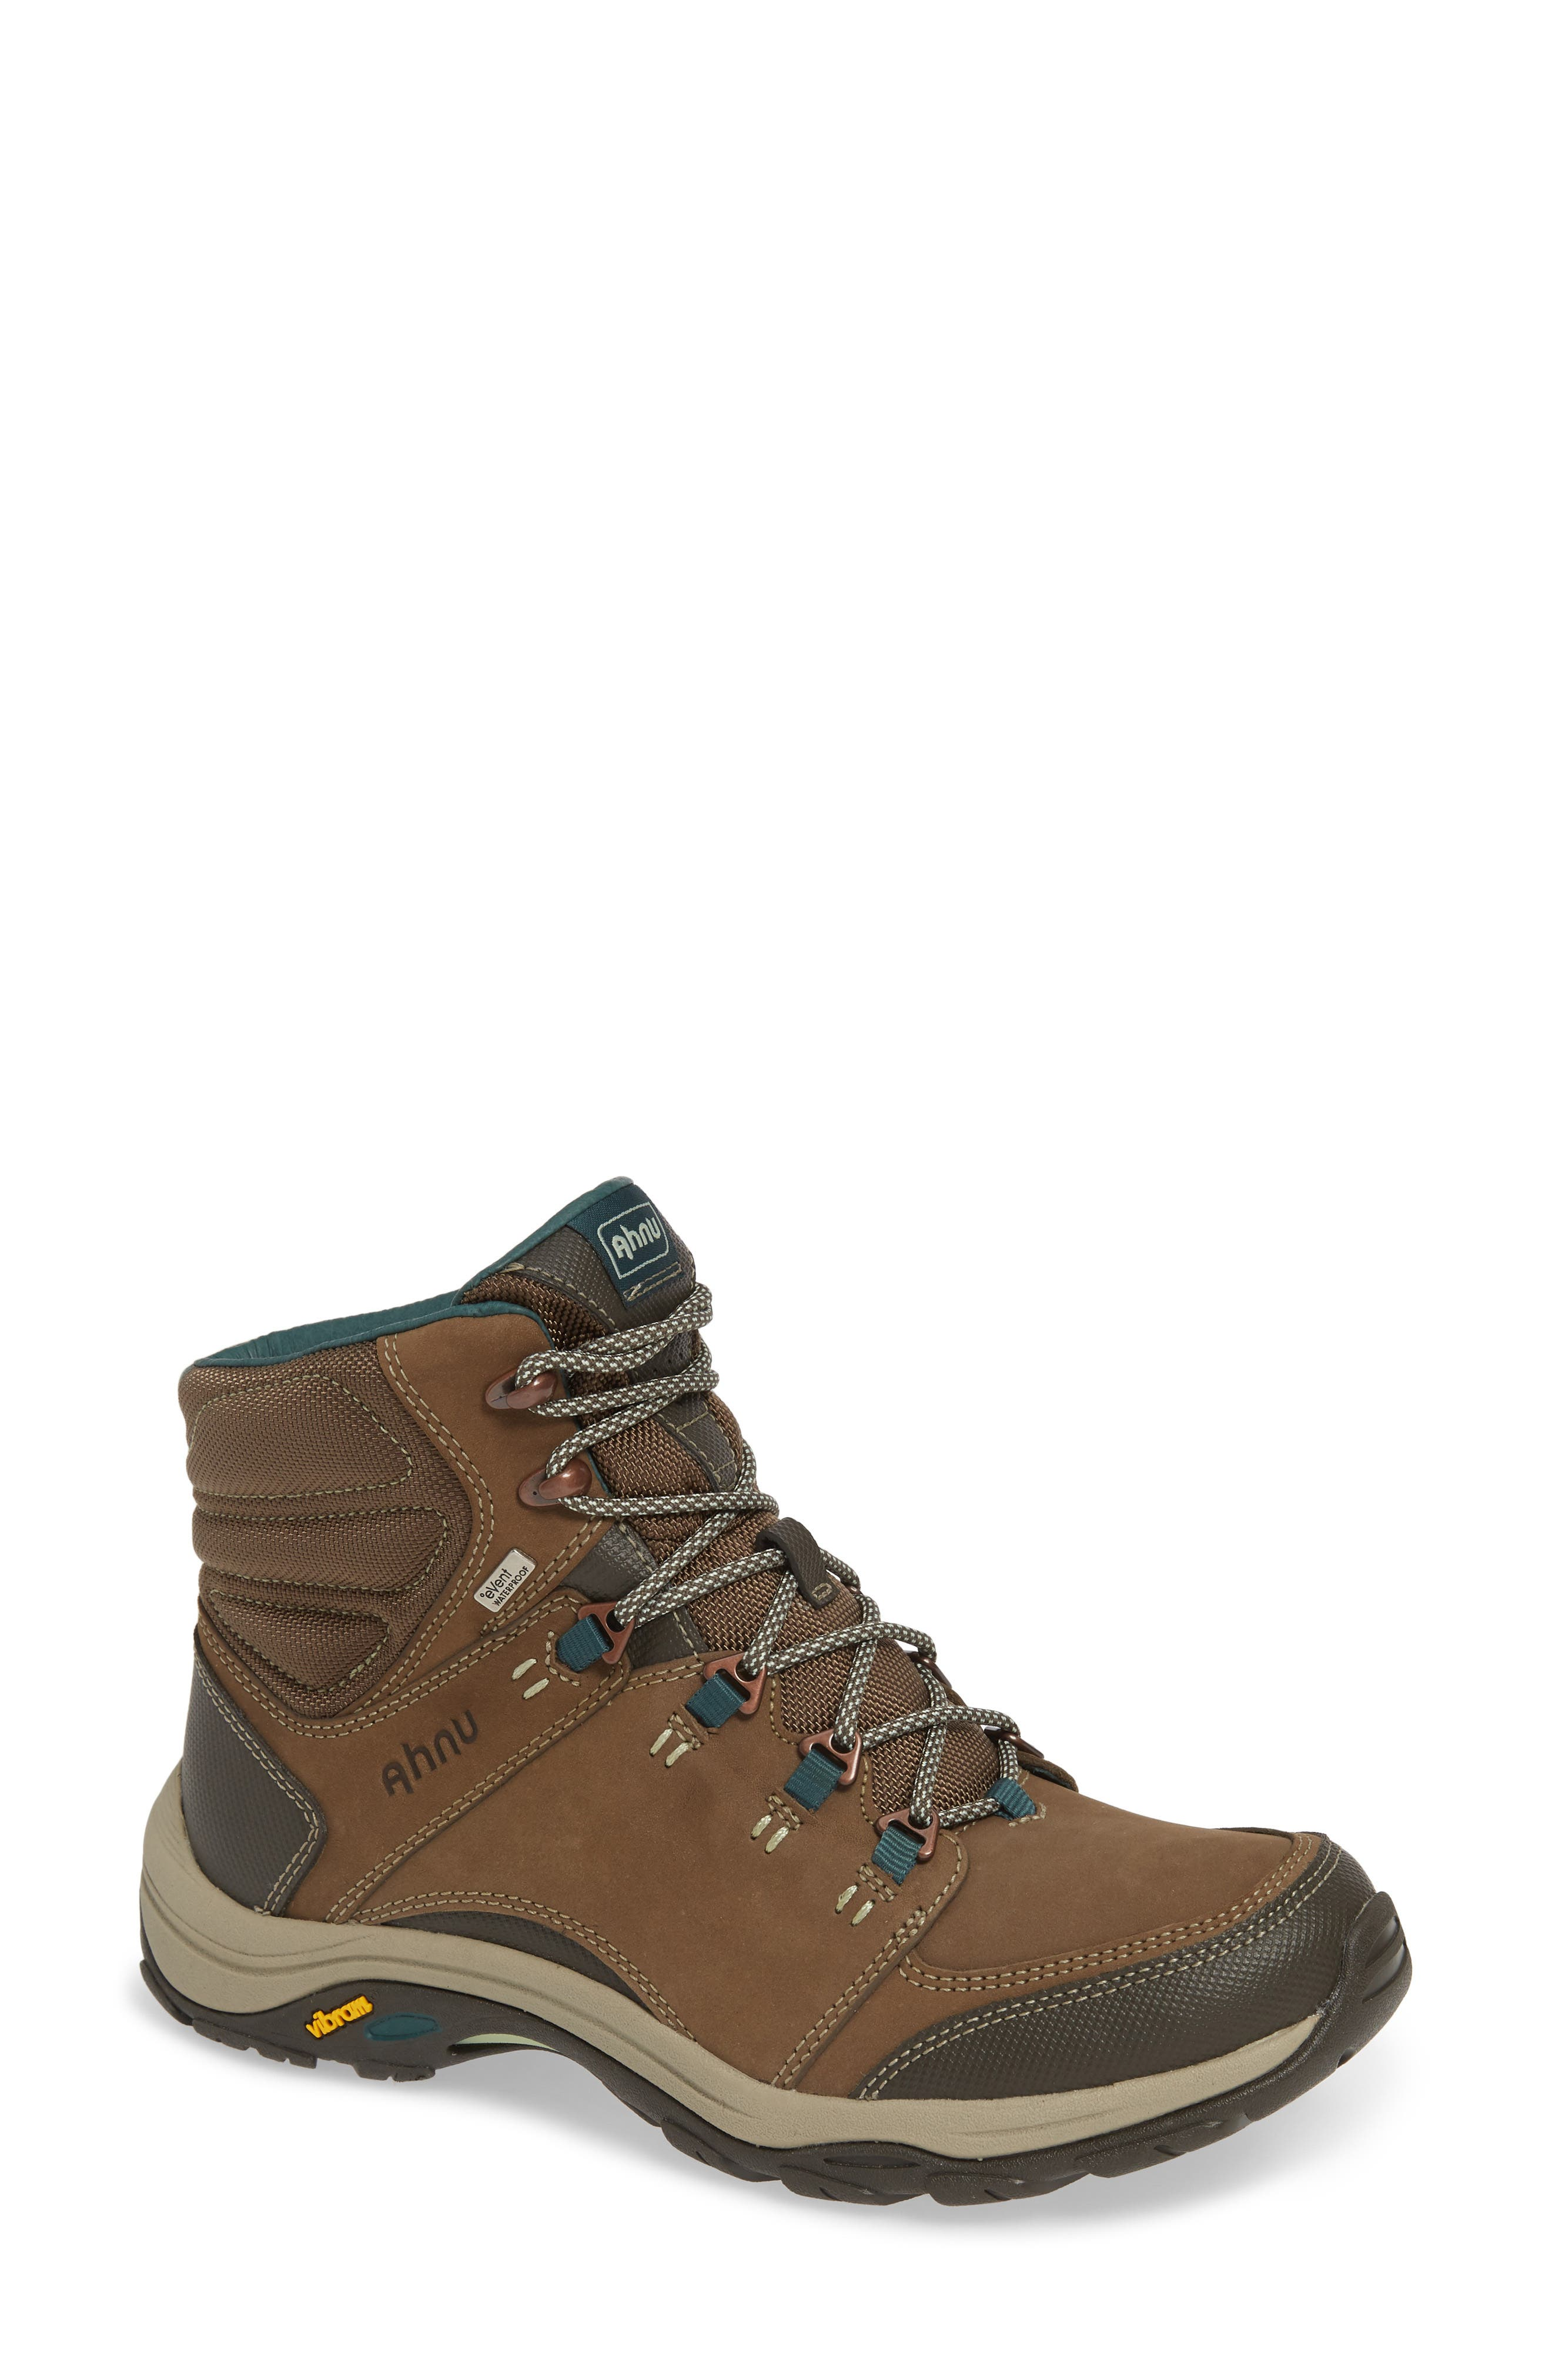 Ahnu by Teva Montara III Waterproof Hiking Boot,                             Main thumbnail 1, color,                             CHOCOLATE CHIP NUBUCK LEATHER